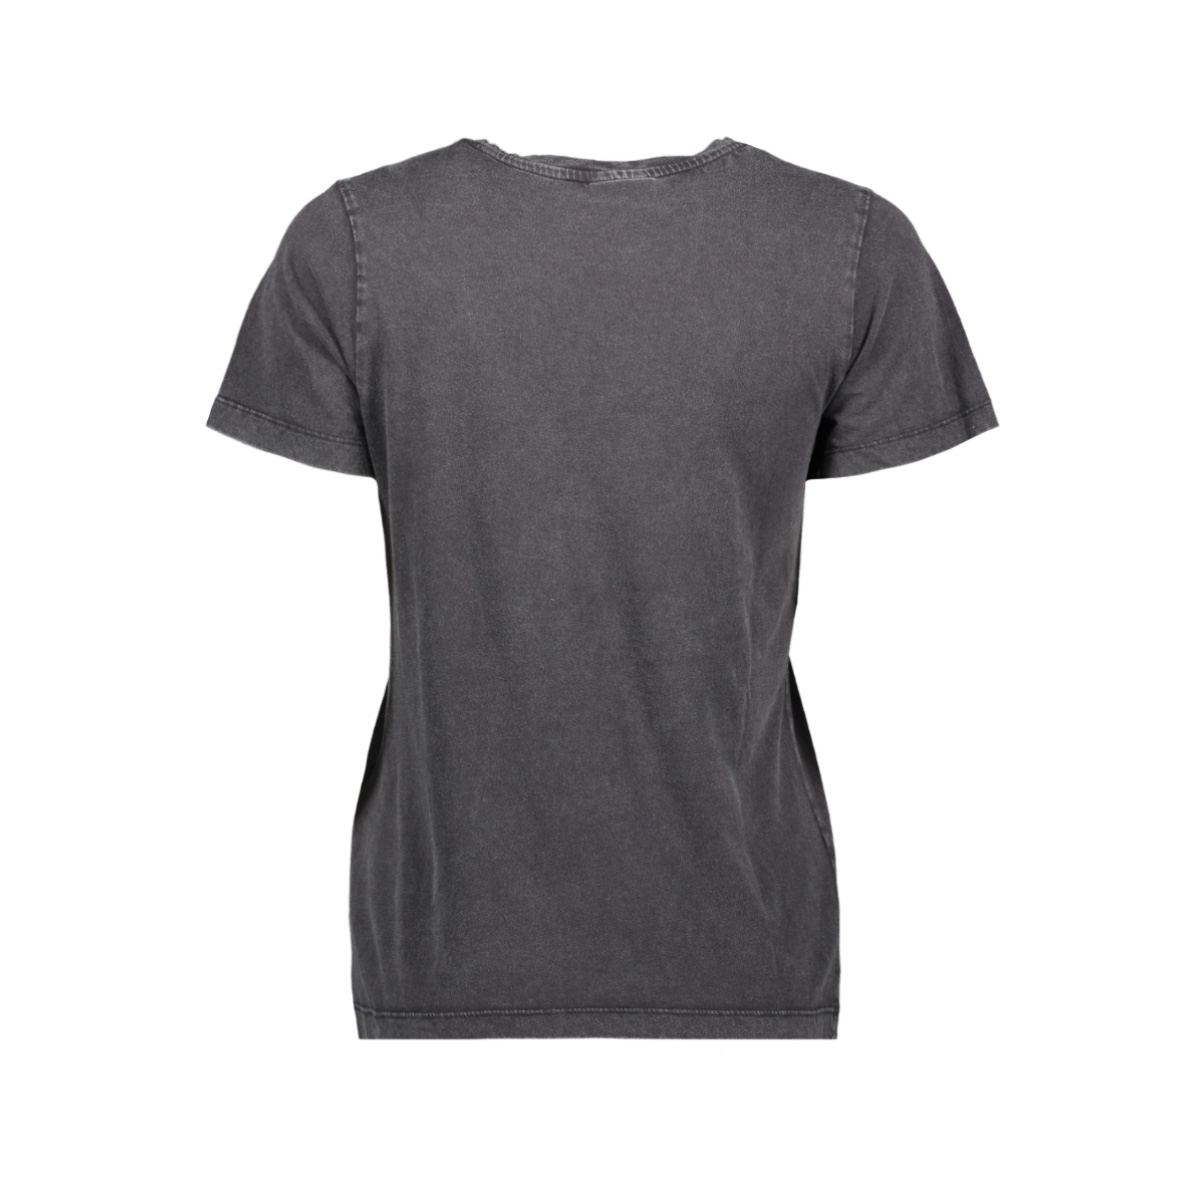 nmnate batman s/s  top 27010344 noisy may t-shirt black/black/flock